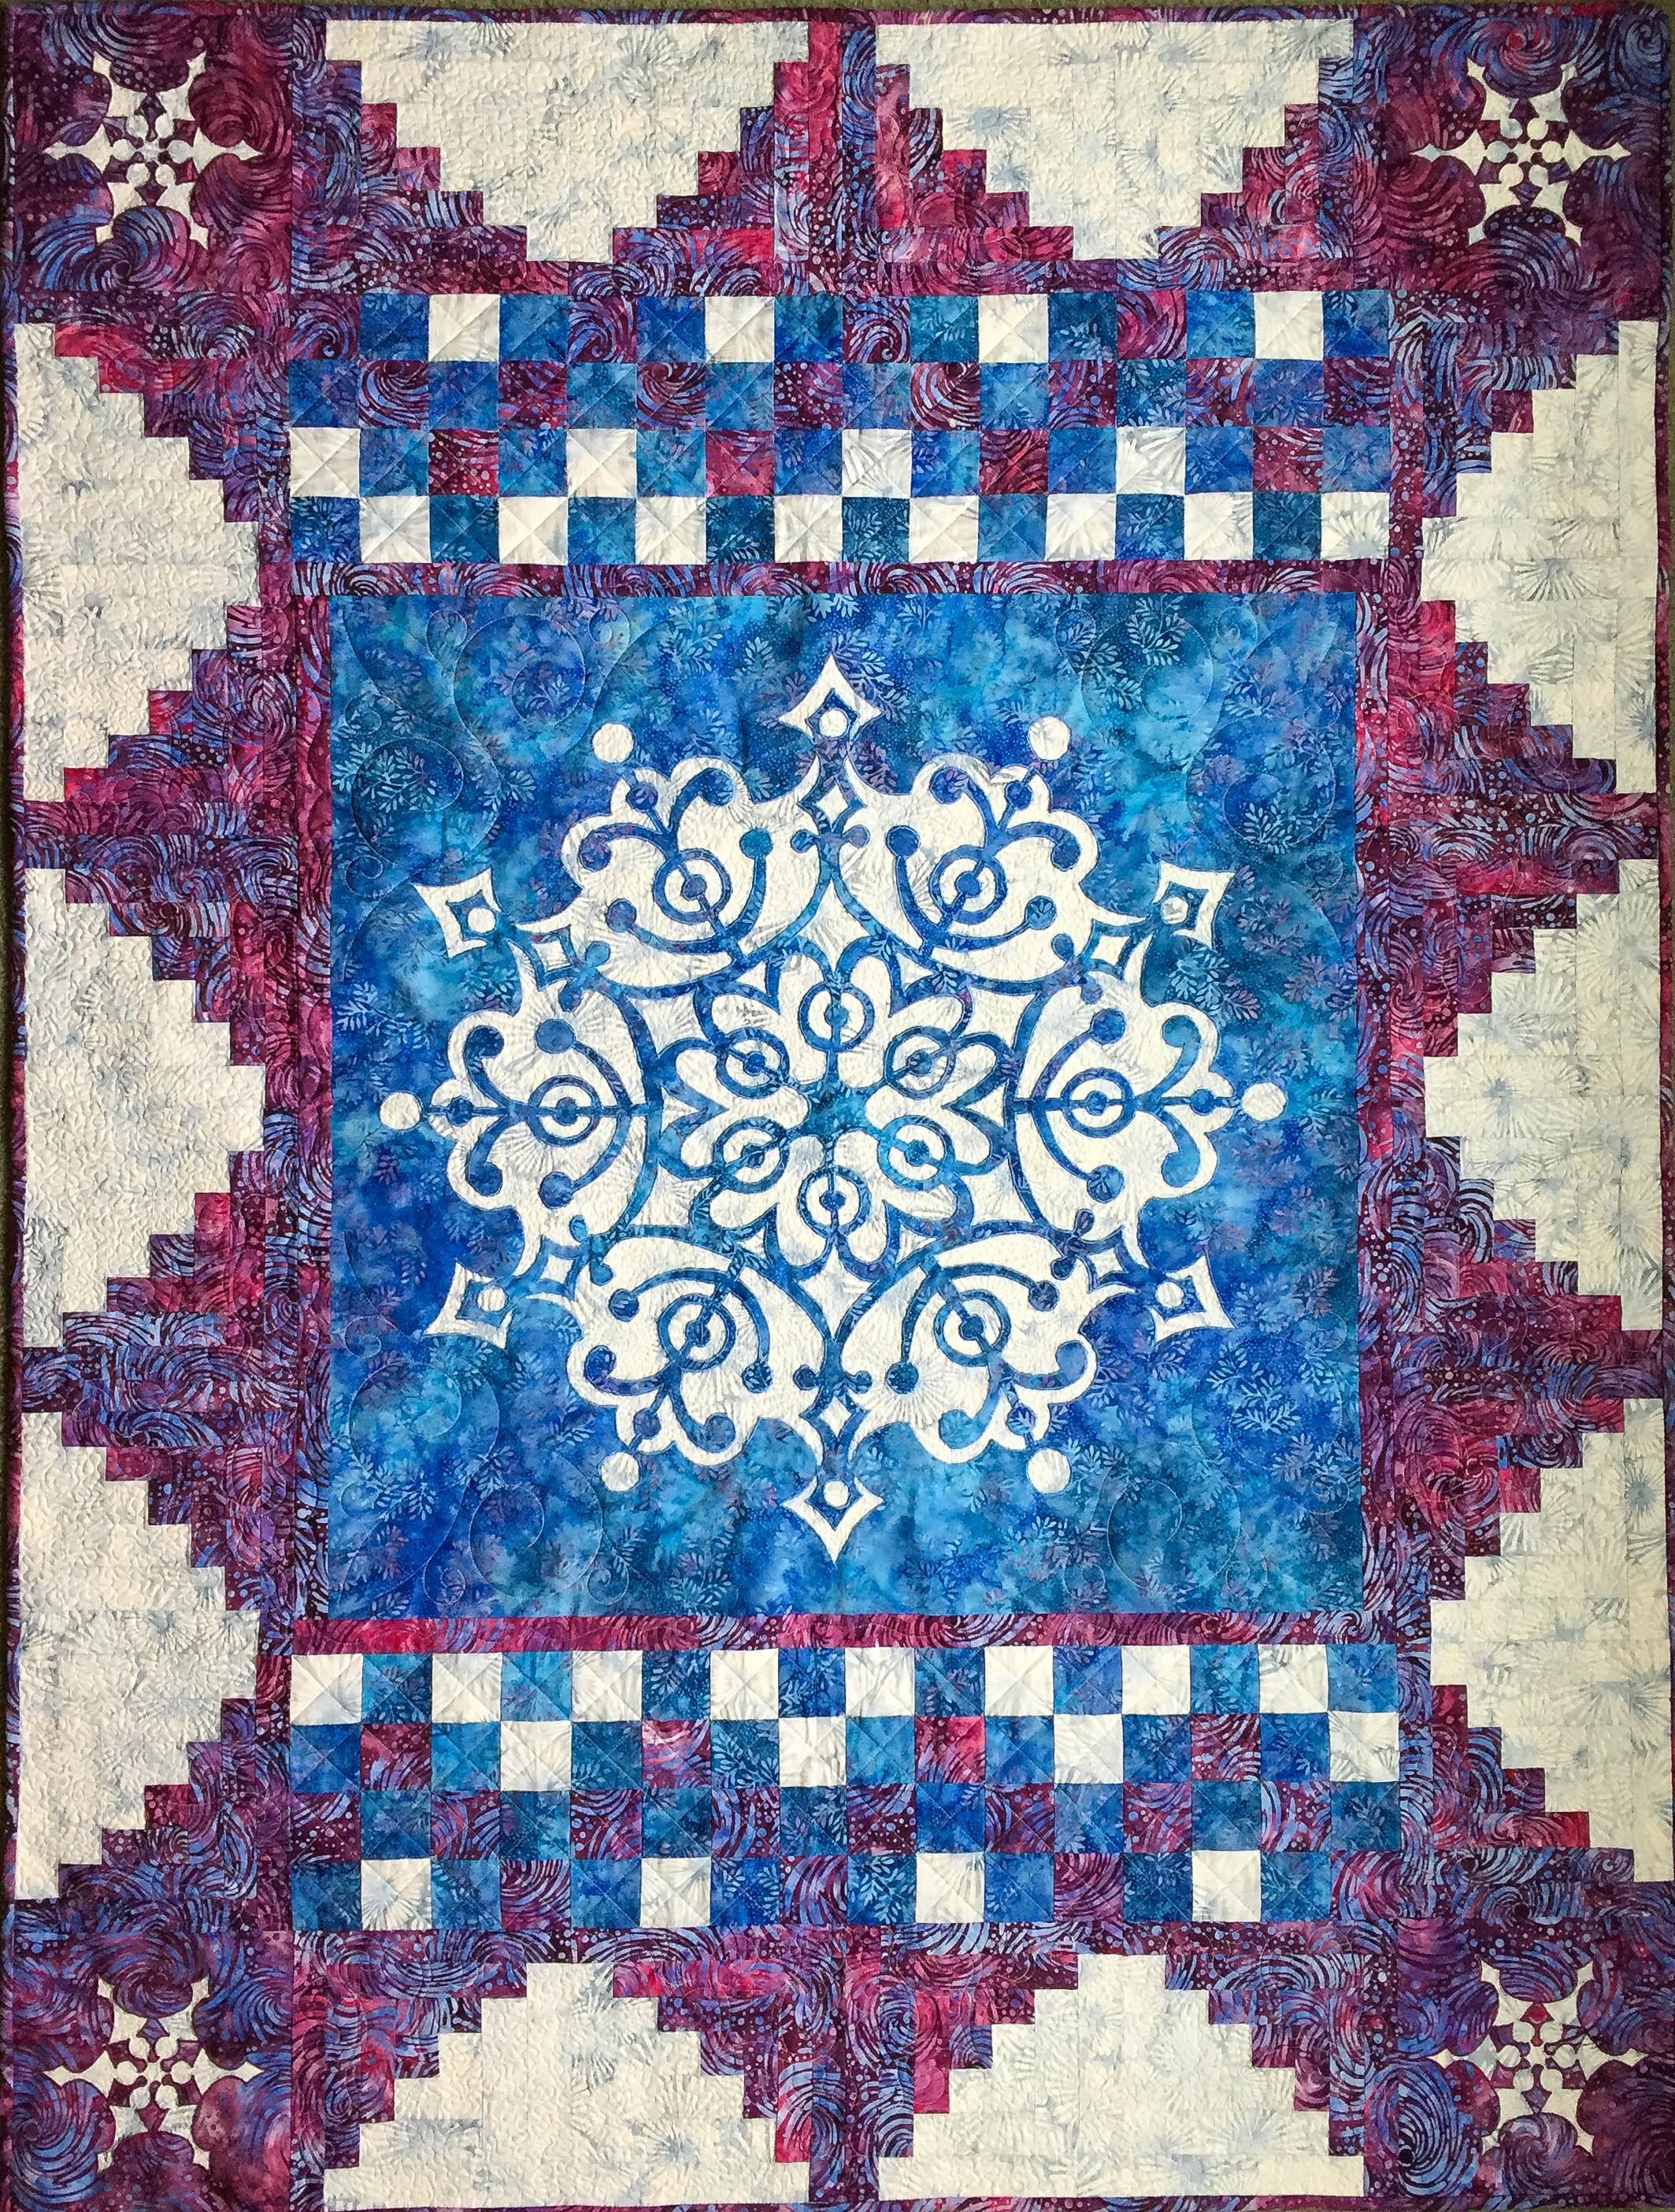 Frosty Frozen Wonder Quilt   . Made with  Frozen Wonder Medallion VIII   and   Frosty Quilt Expansion   pattern.